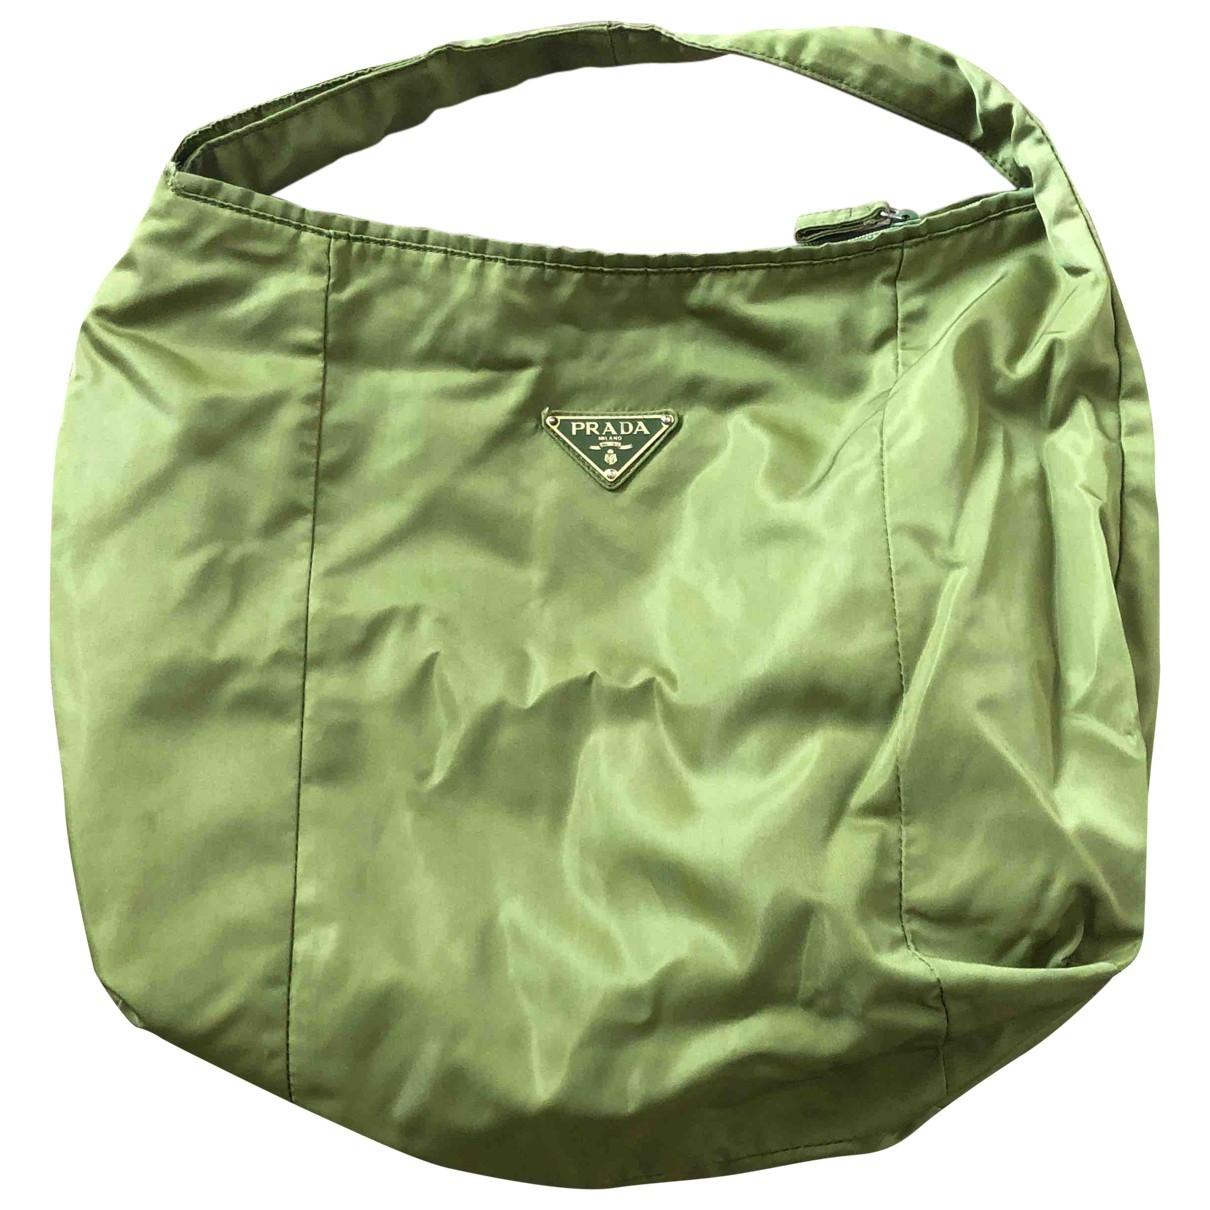 Prada \N Green handbag for Women \N